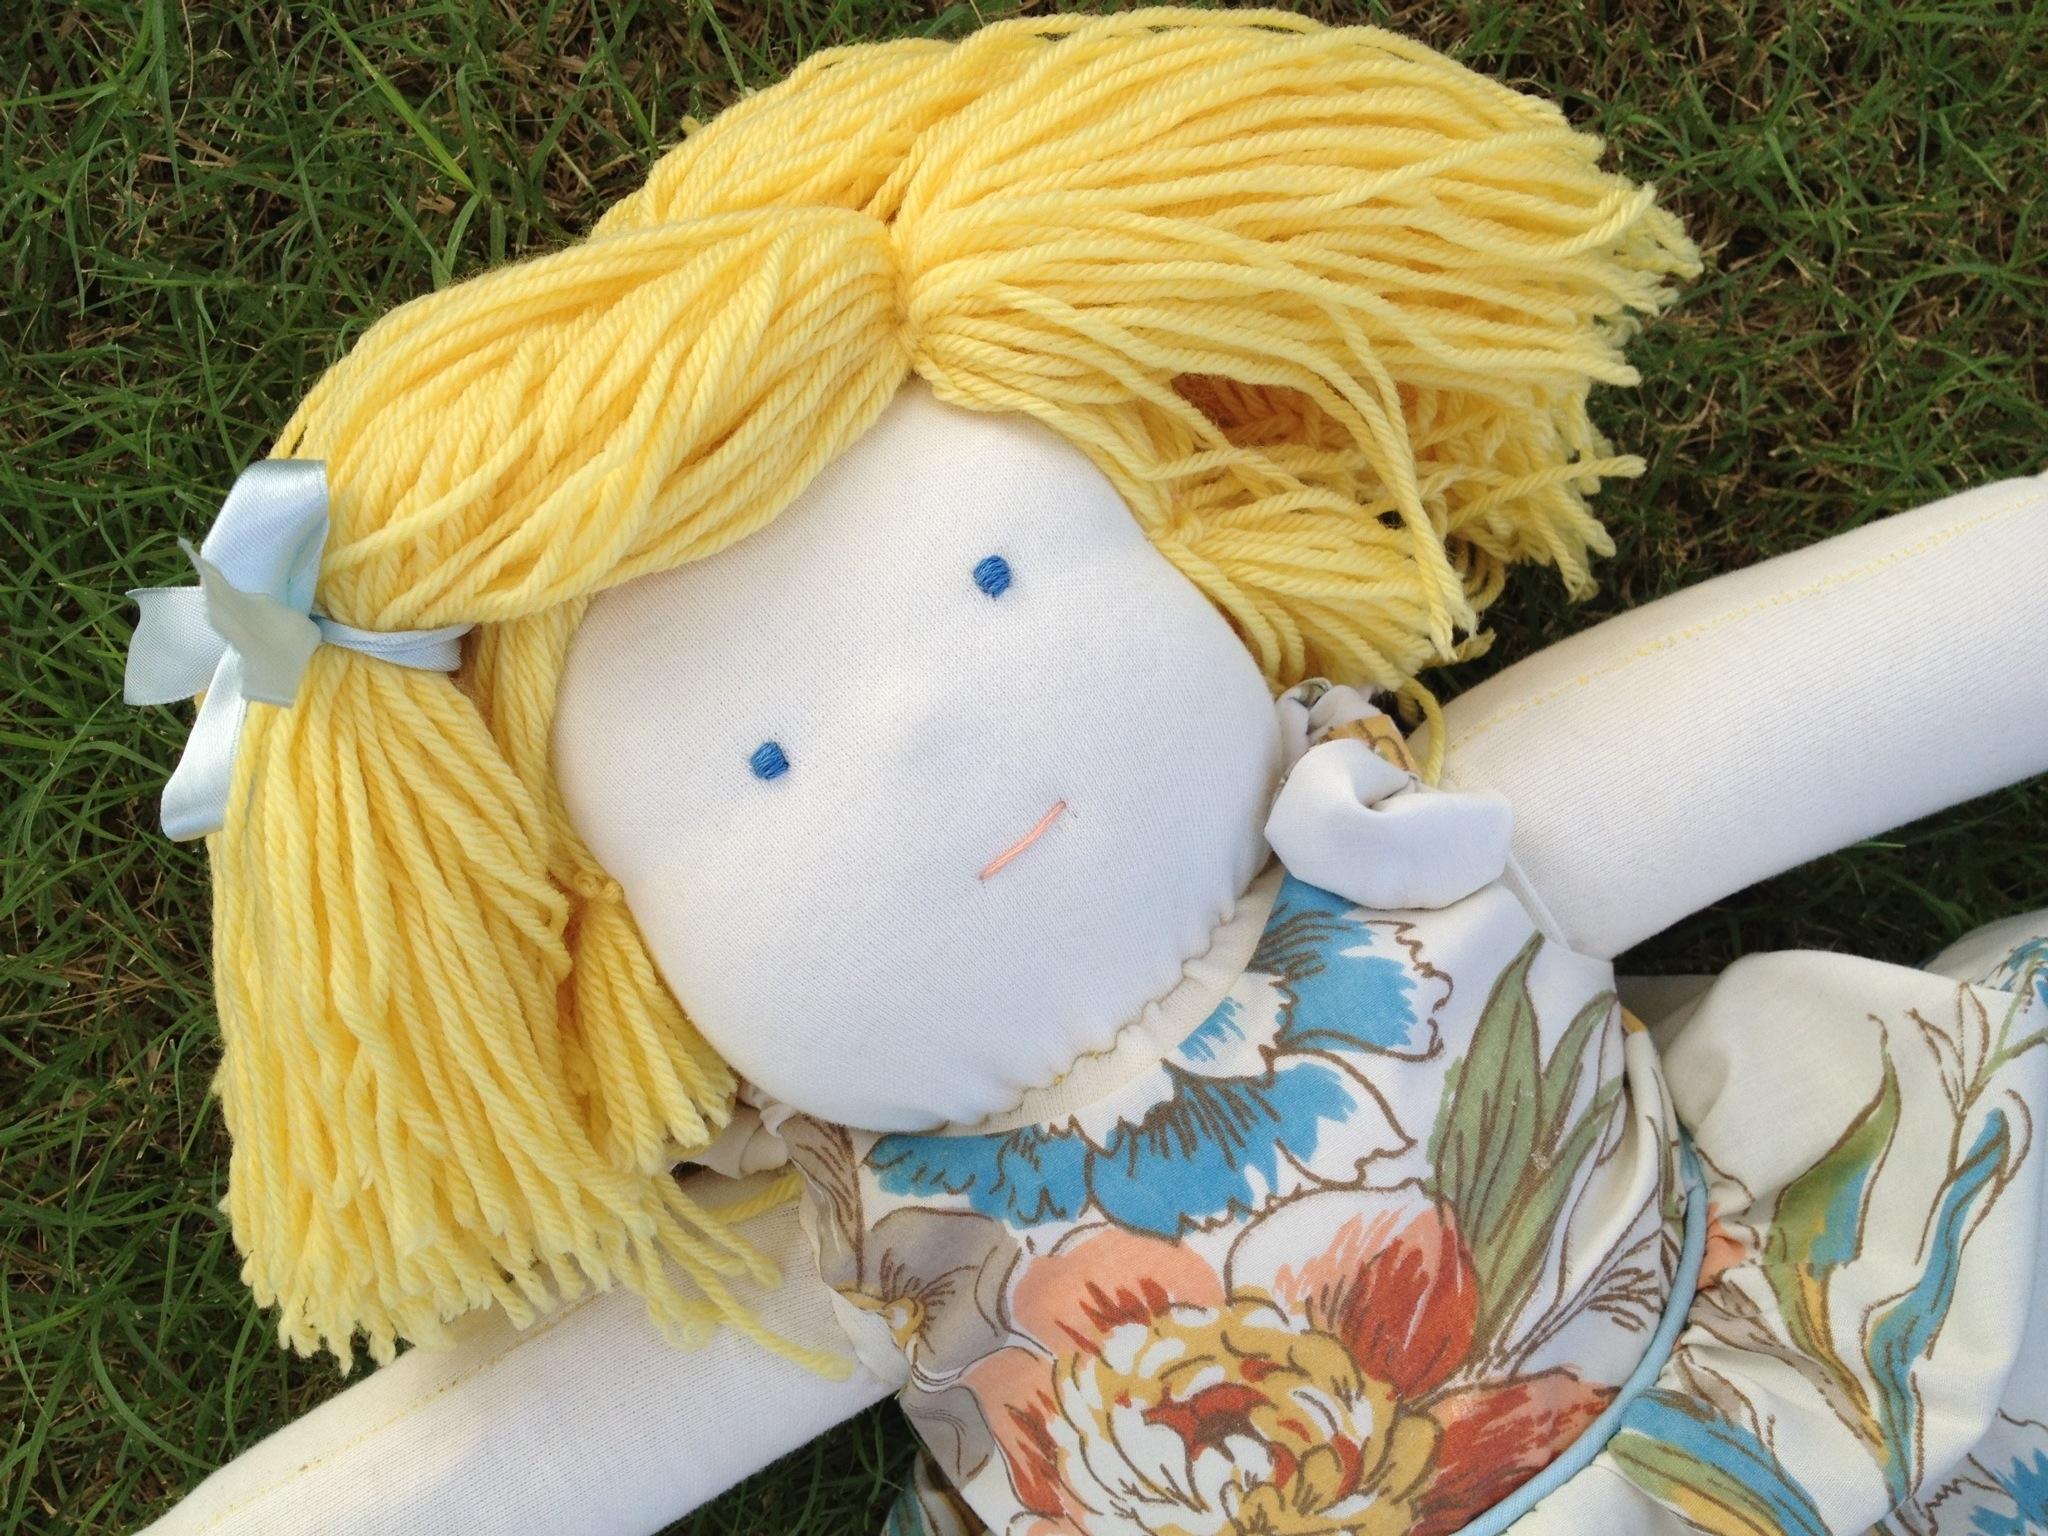 Amelia's Waldorf doll